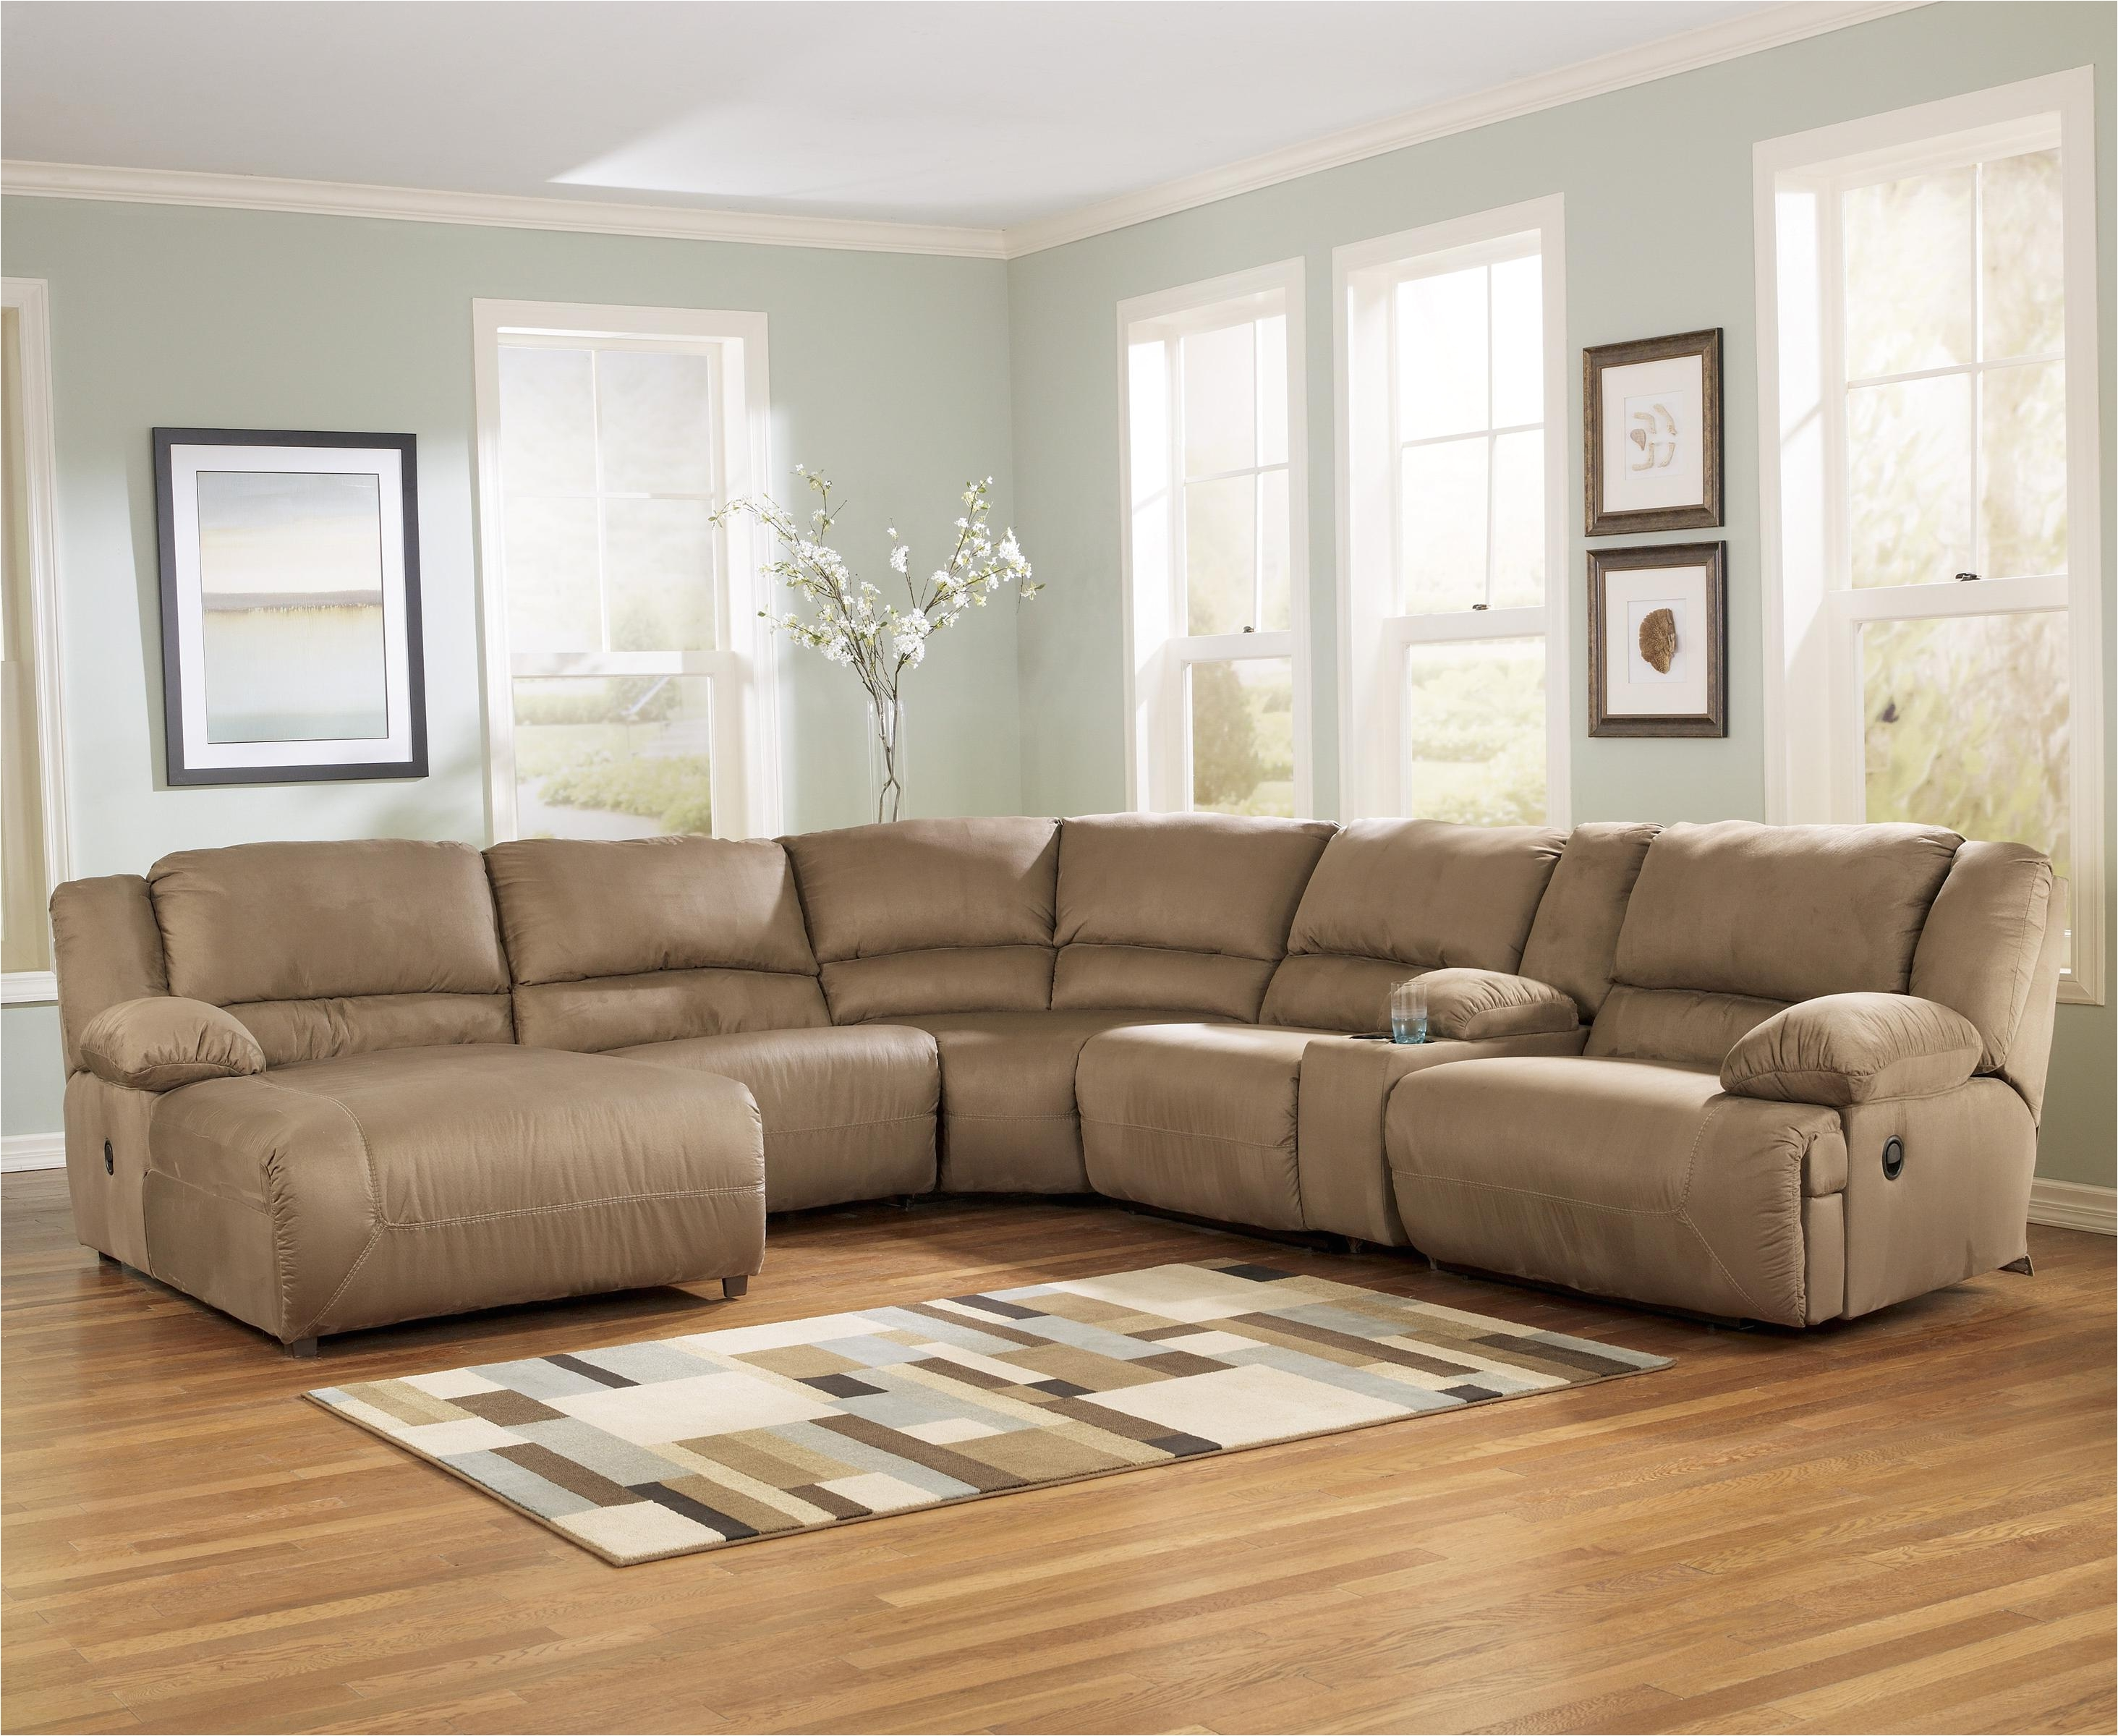 Ashley Furniture Midland Tx Signature Design by ashley Hogan Mocha 6 Piece Motion Sectional